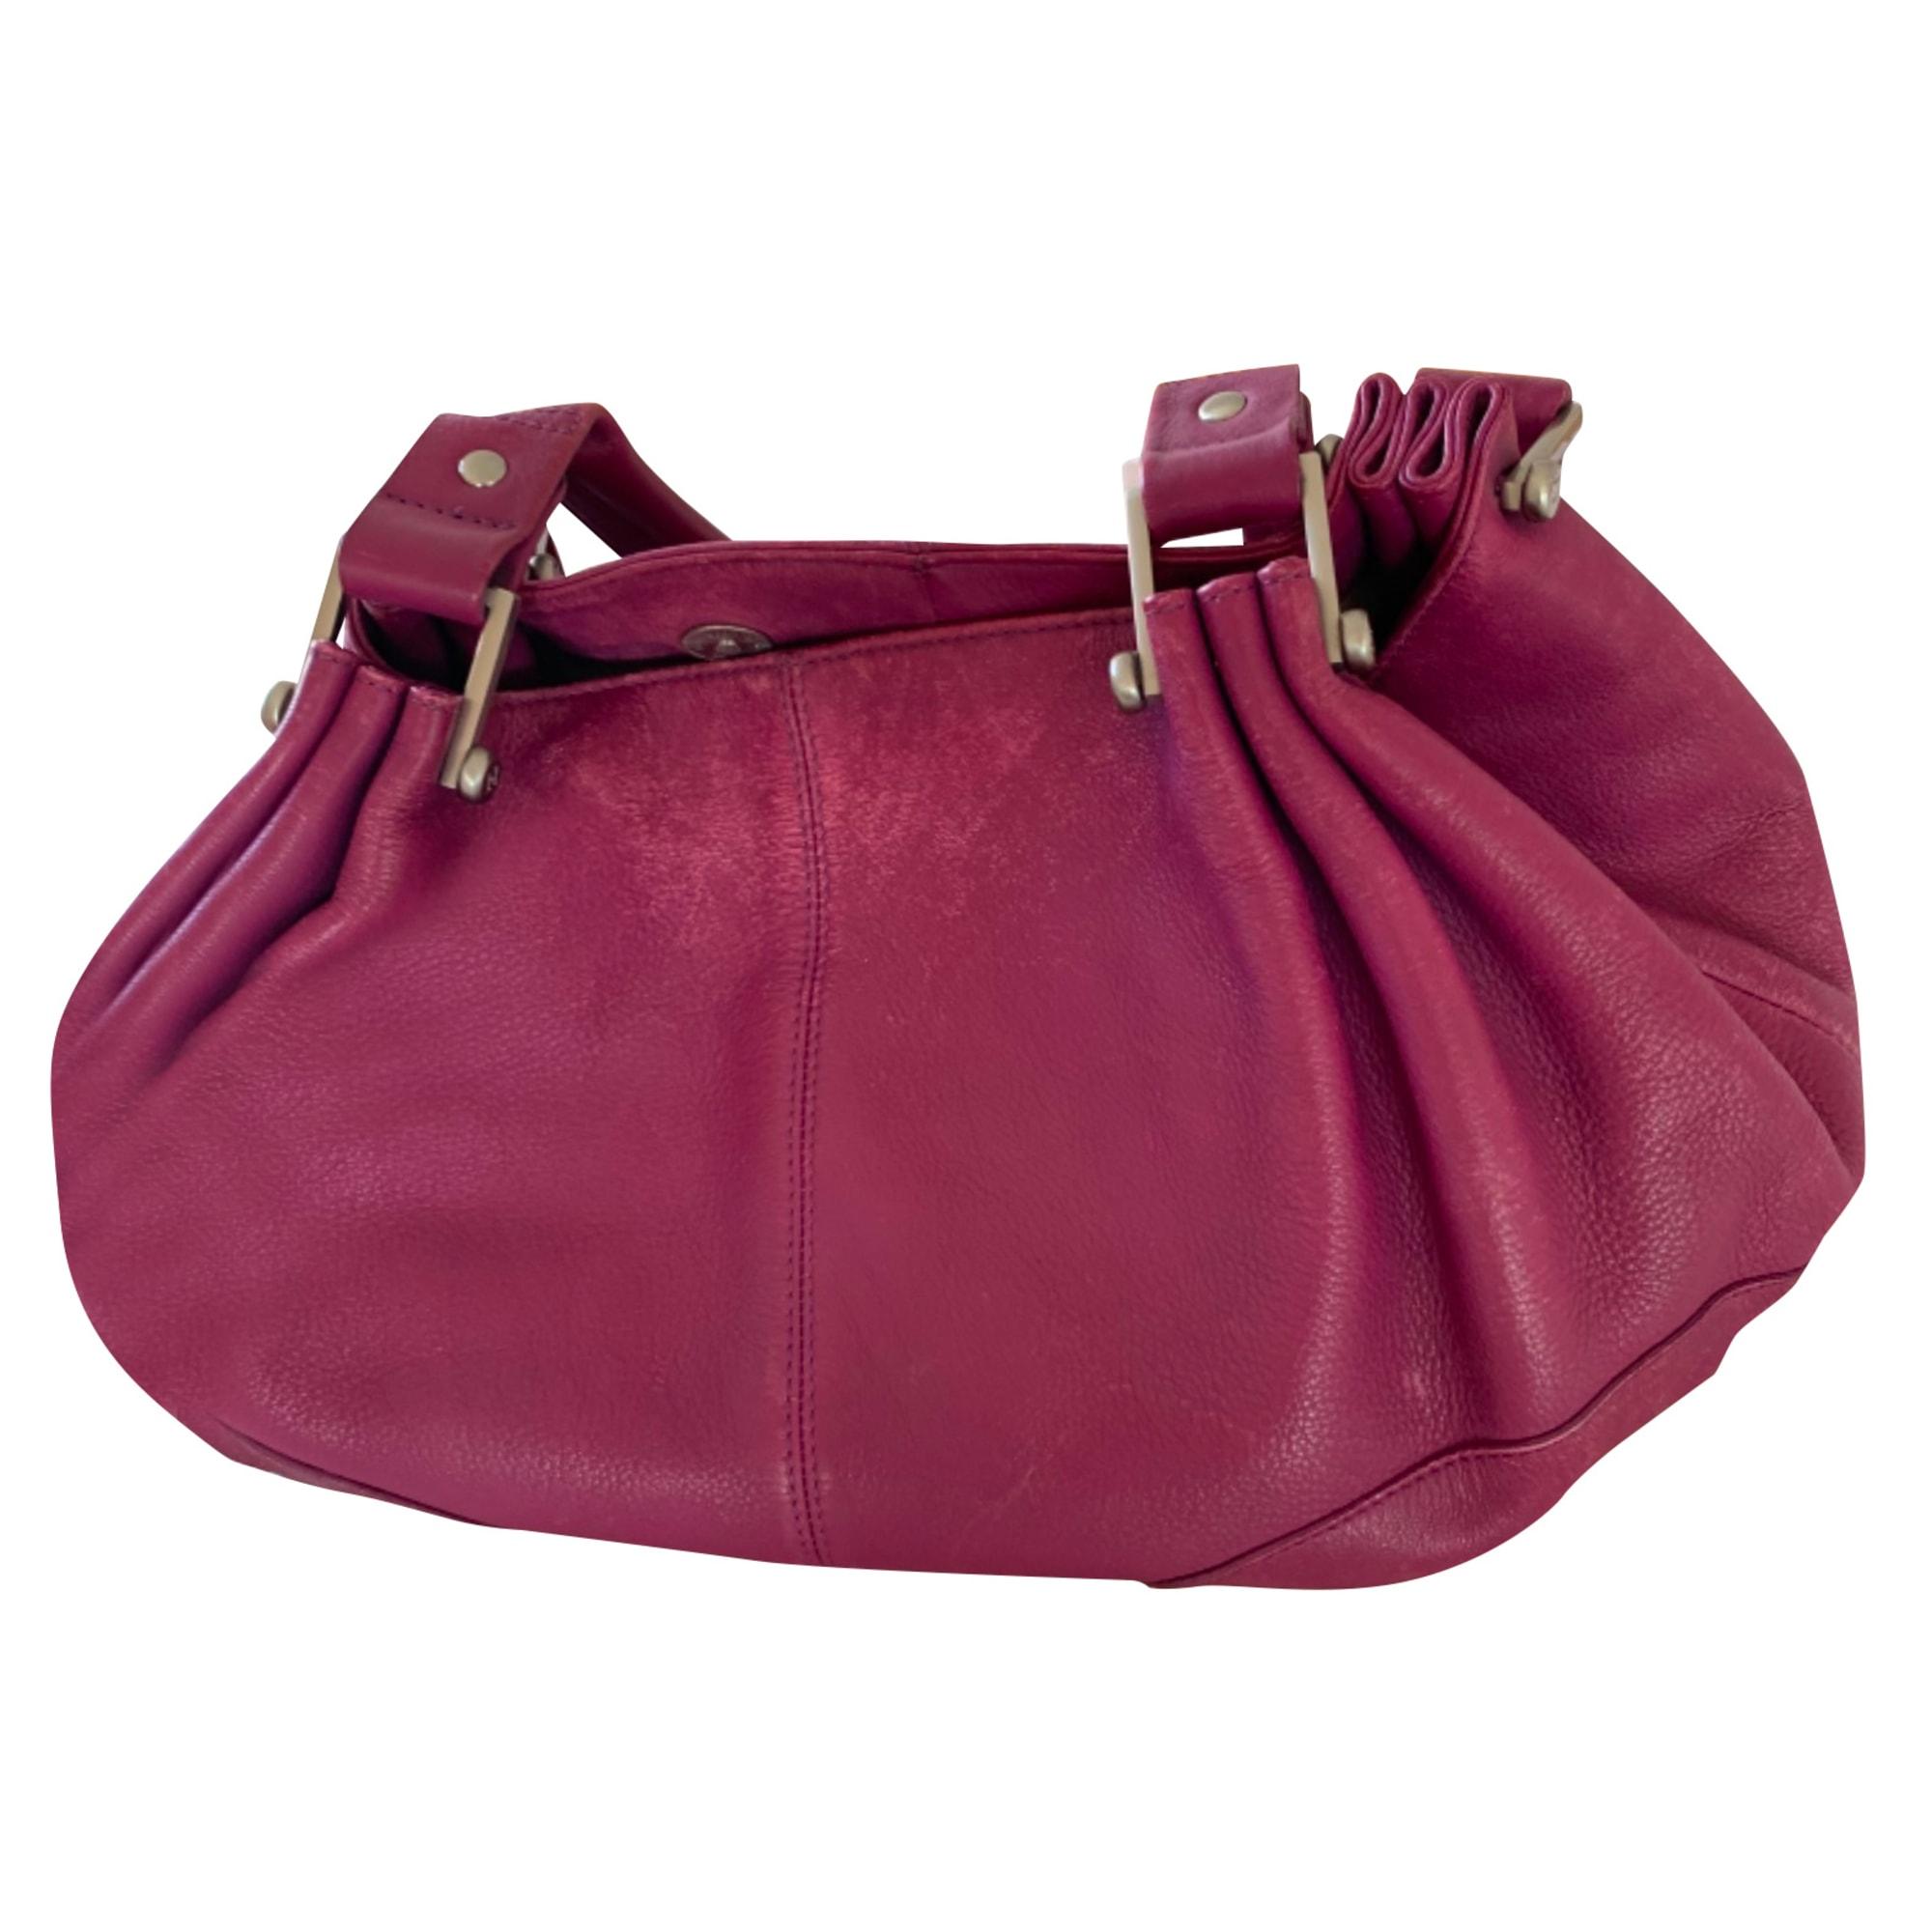 Lederhandtasche LE TANNEUR Violett, malvenfarben, lavendelfarben